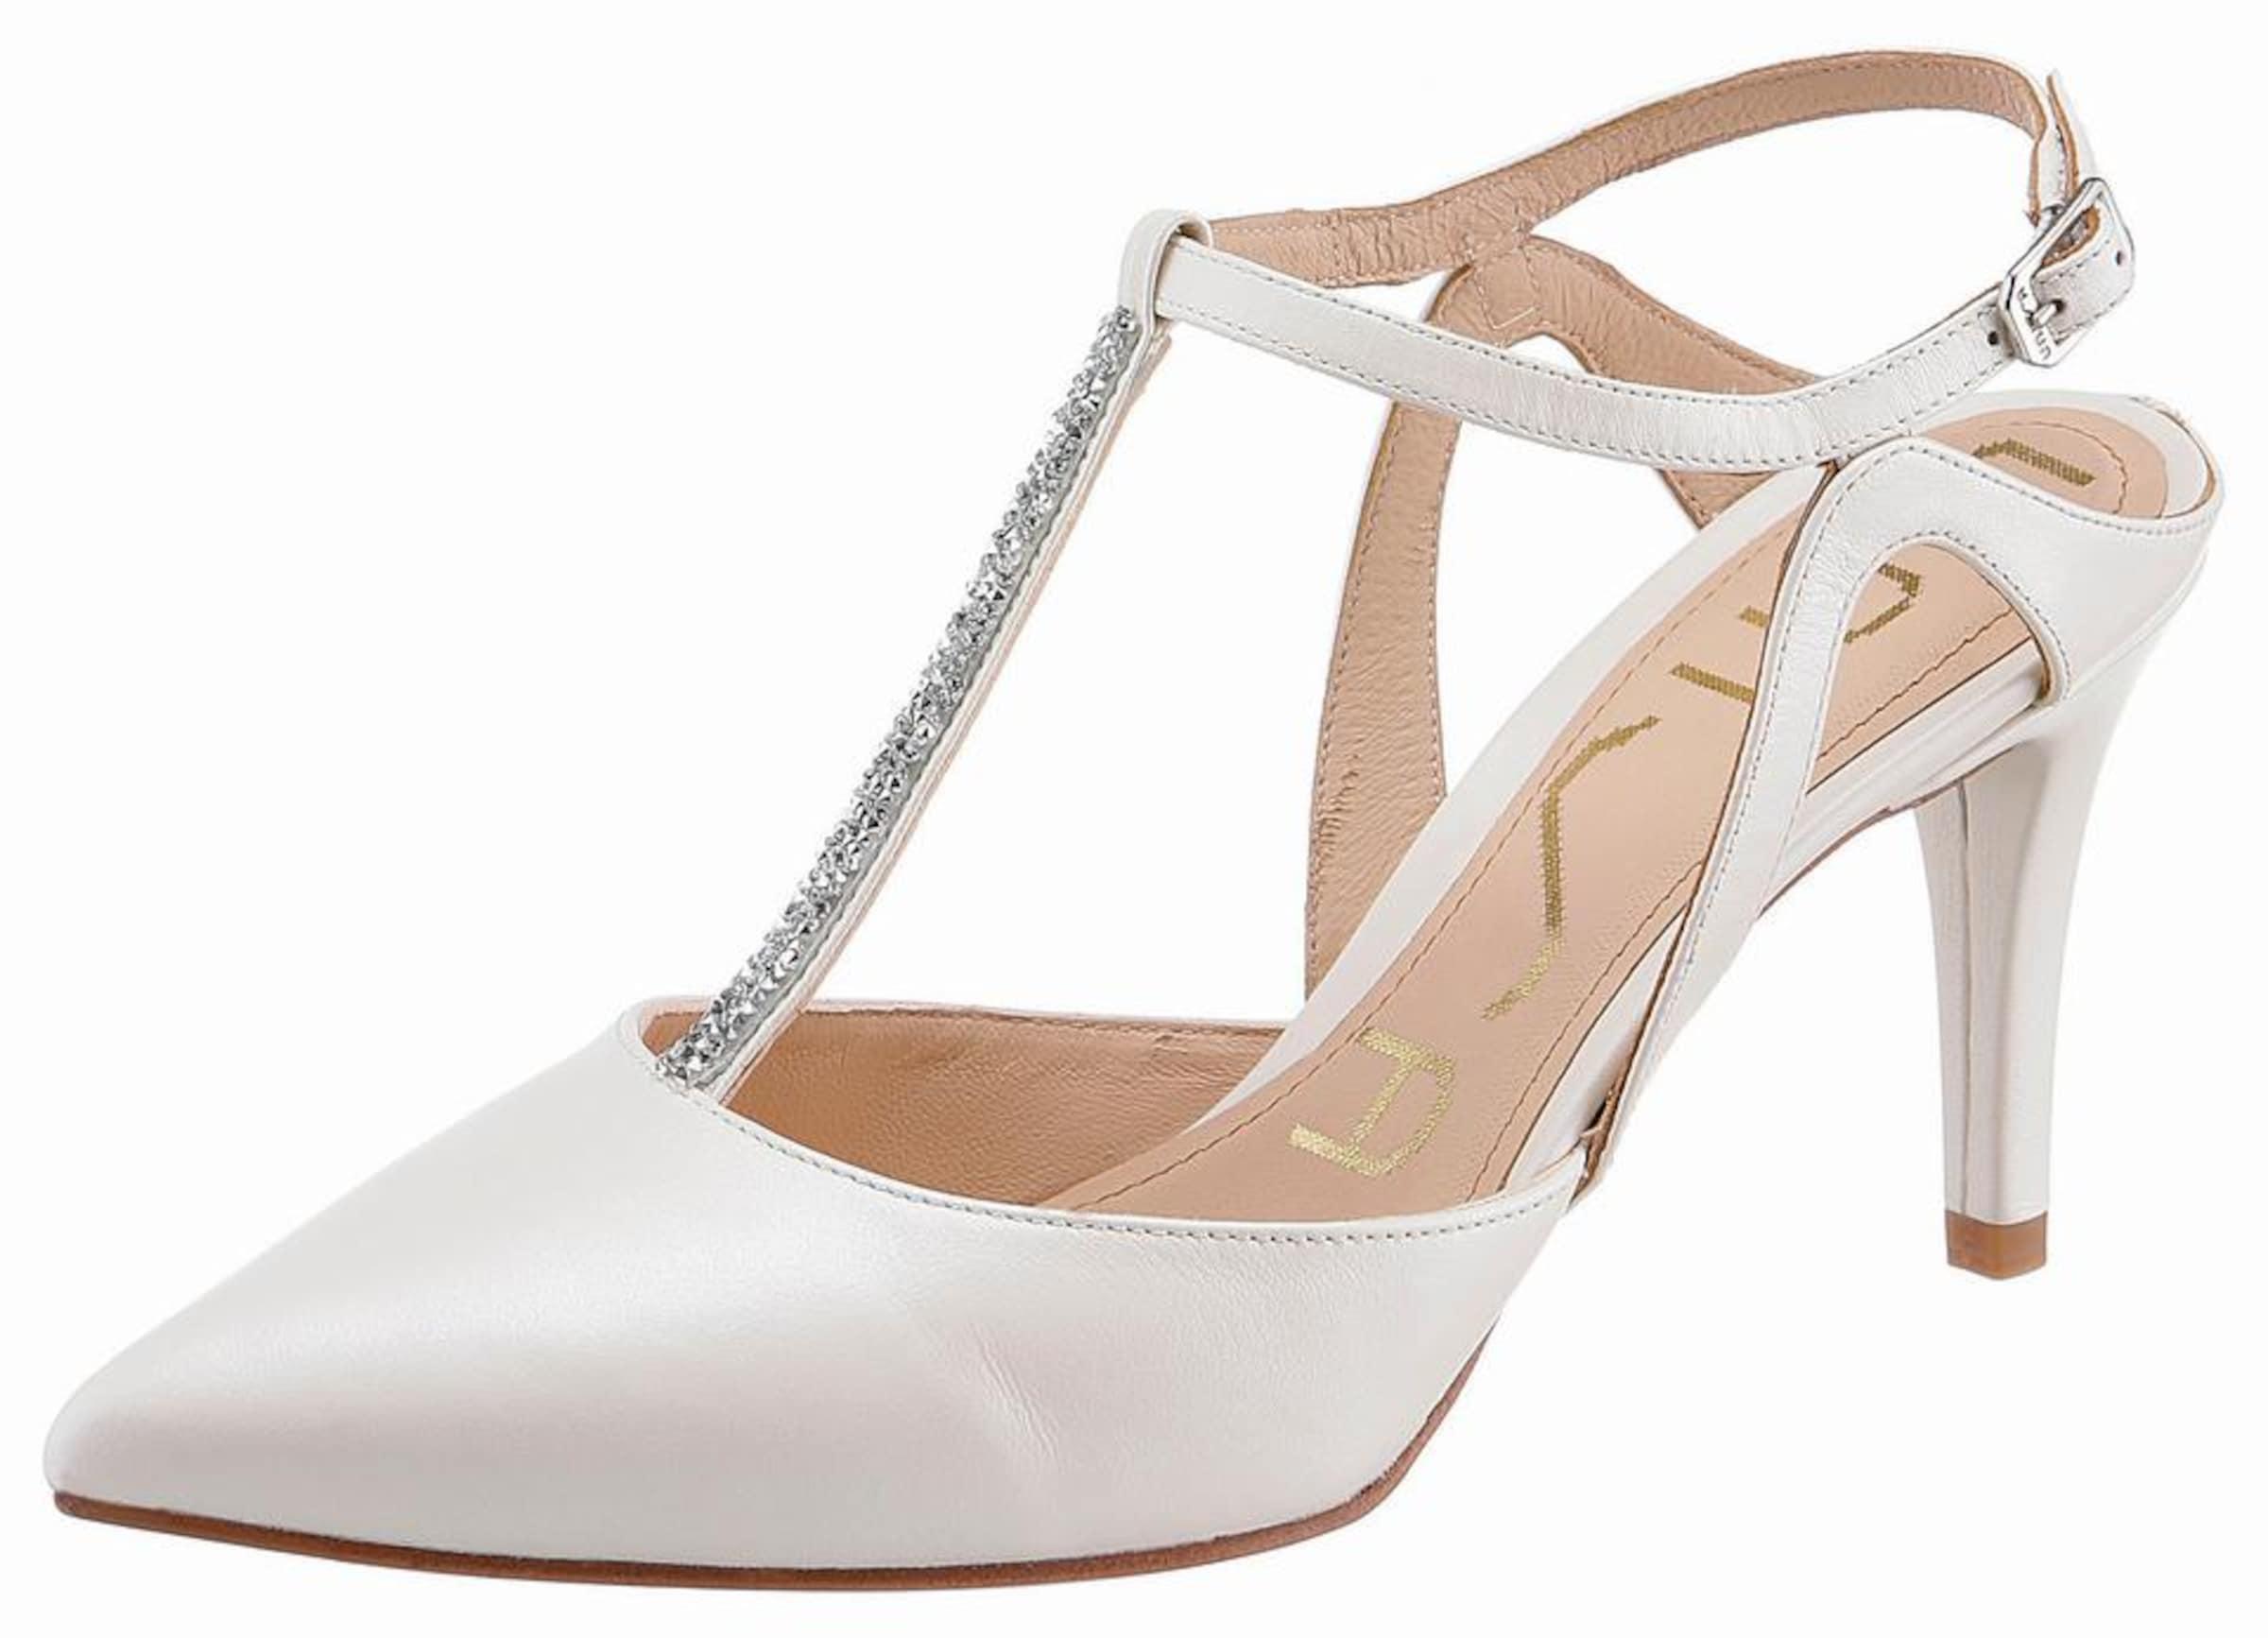 UNISA Slingpumps Günstige und langlebige Schuhe